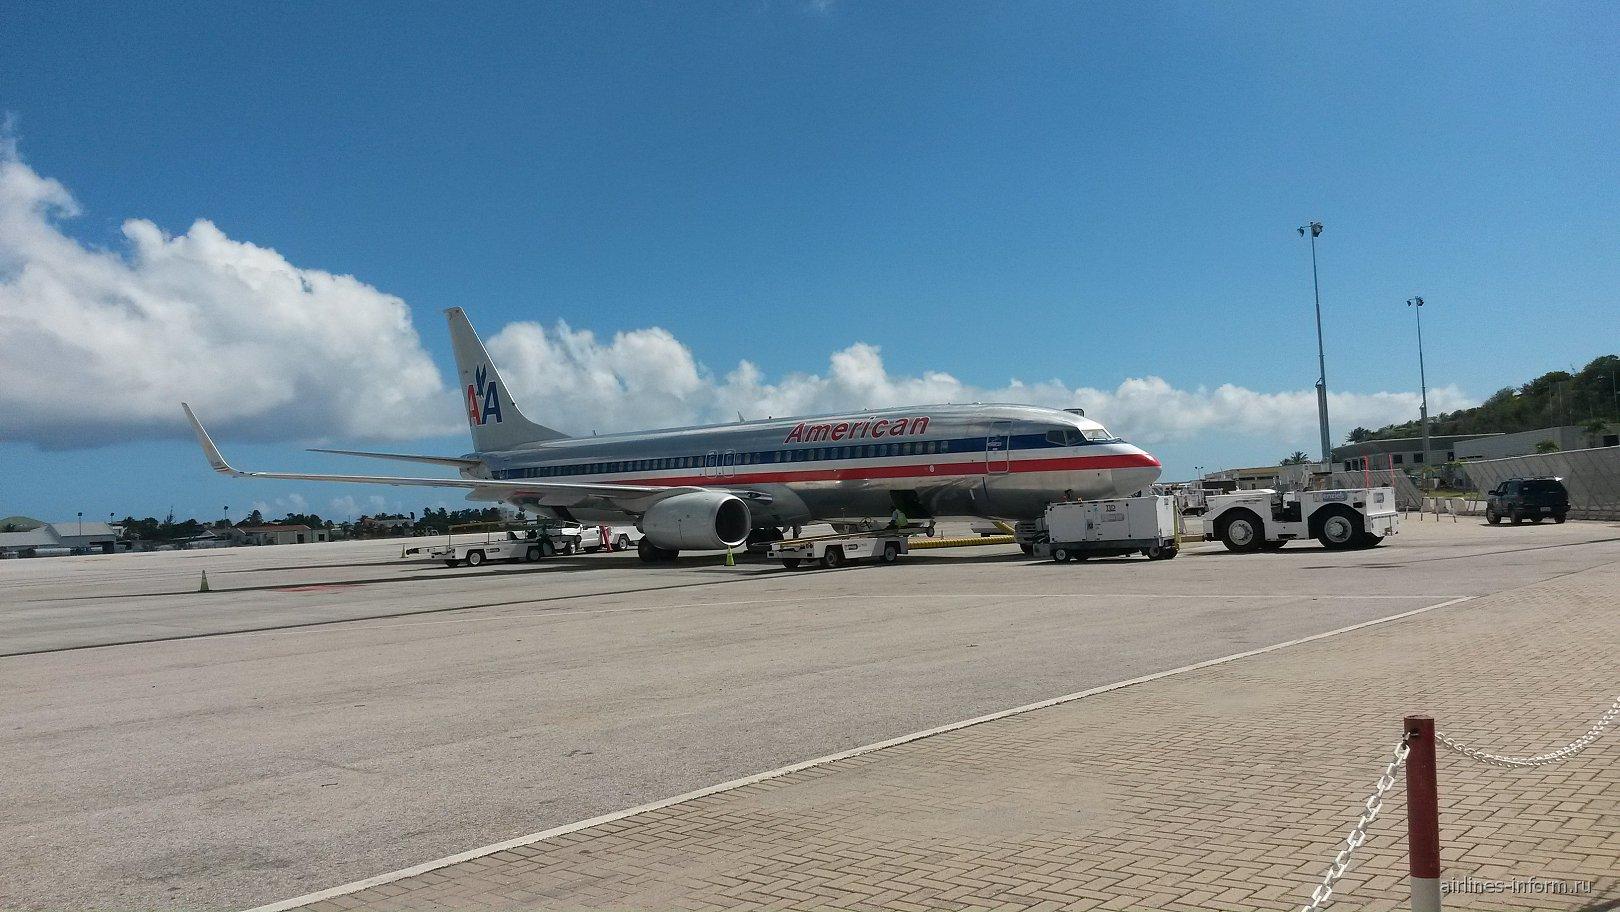 Боинг-737-800 Американских авиалиний в аэропорту Сен-Мартен